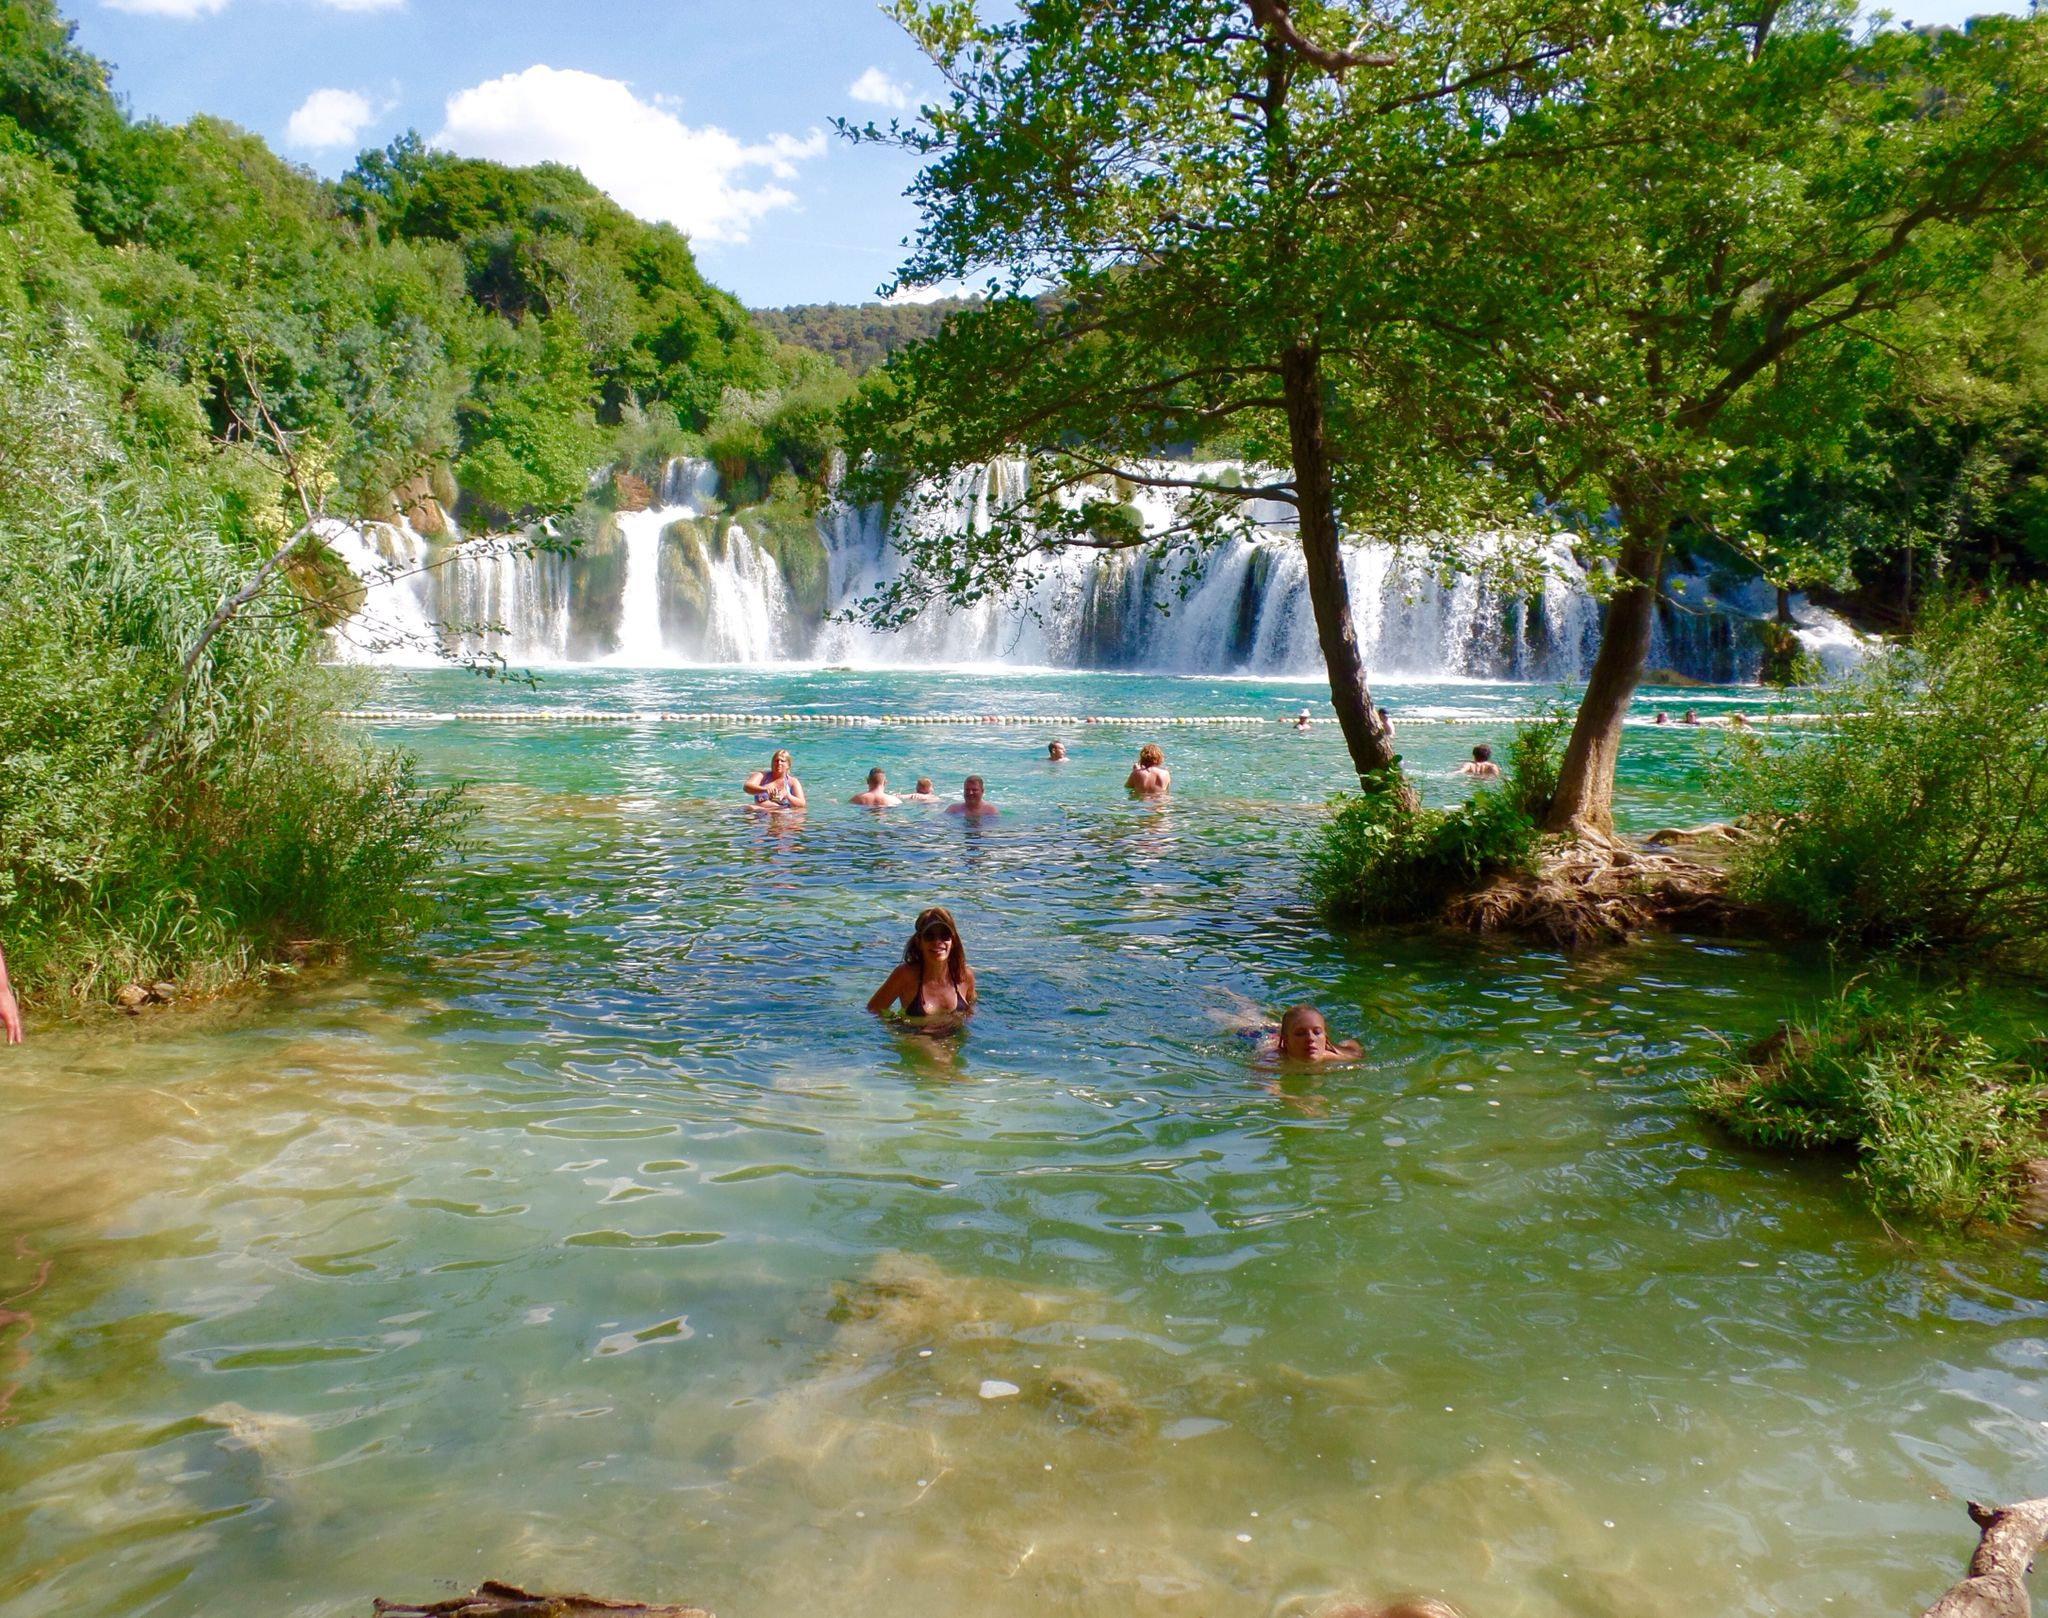 Swimming at Krka Falls in Croatia.... Such a beautiful place.